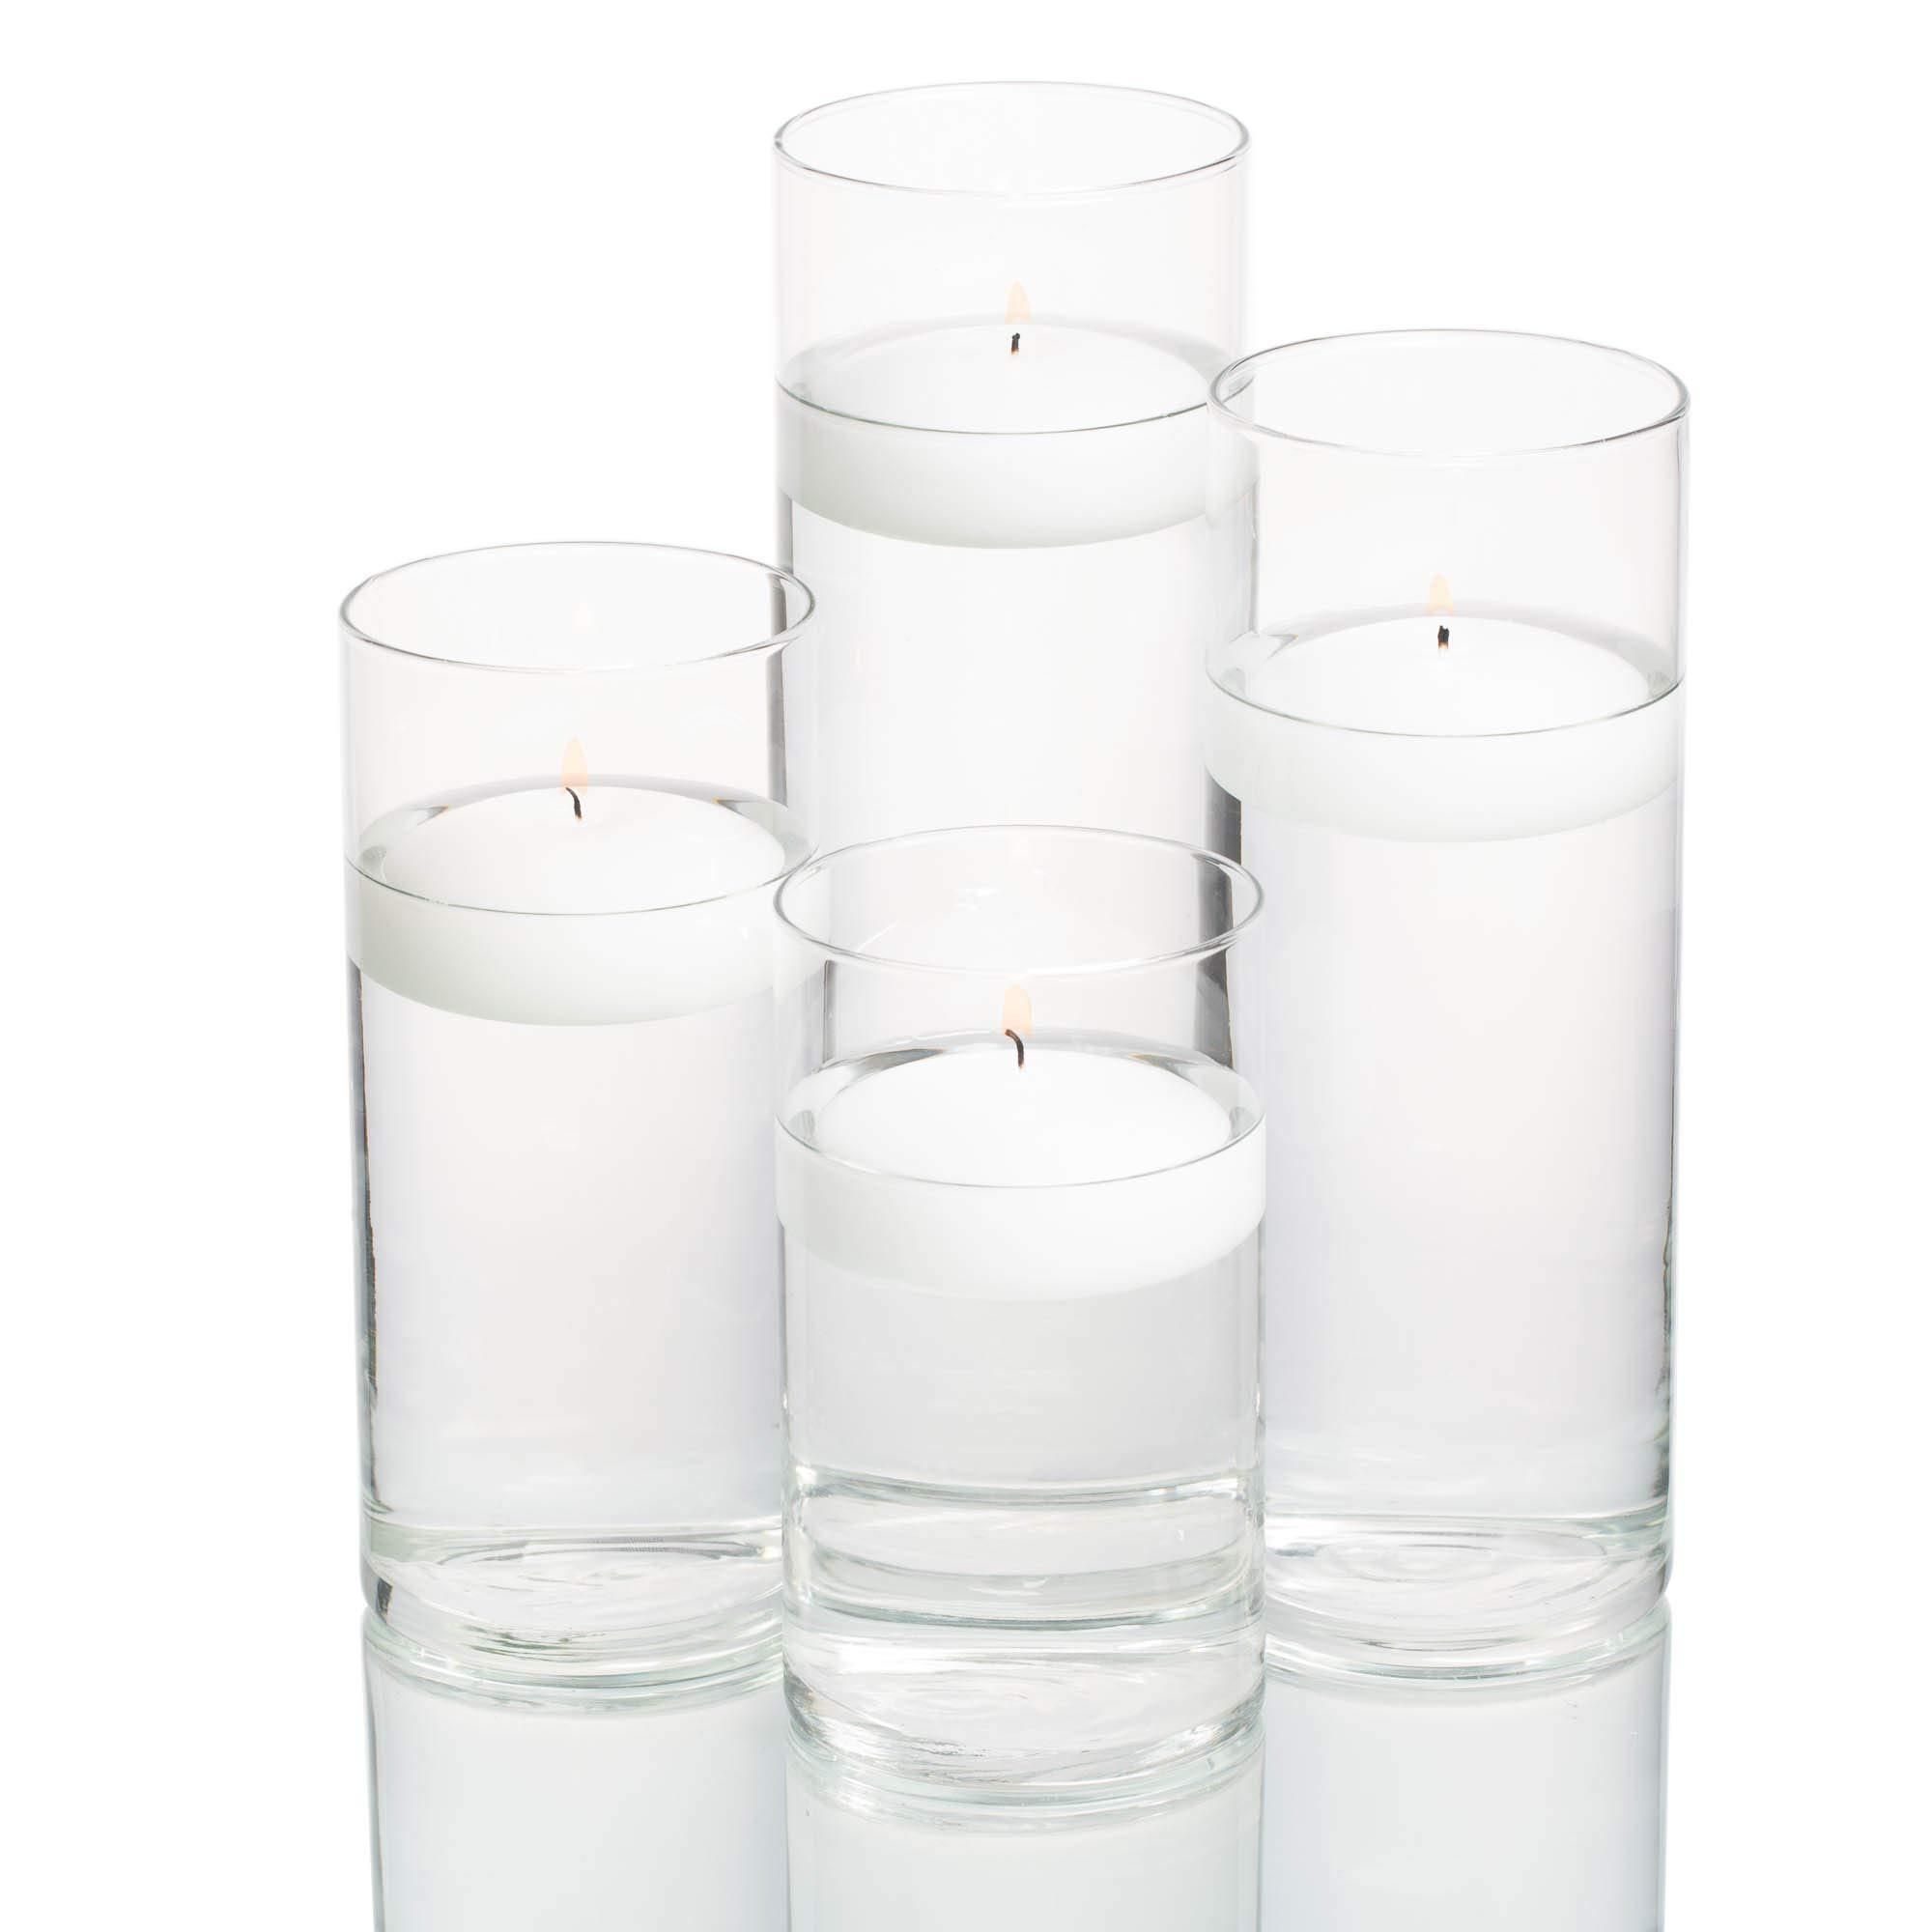 Set of 4 Eastland Cylinder Vases and 4 White Richland Floating Candles 3''